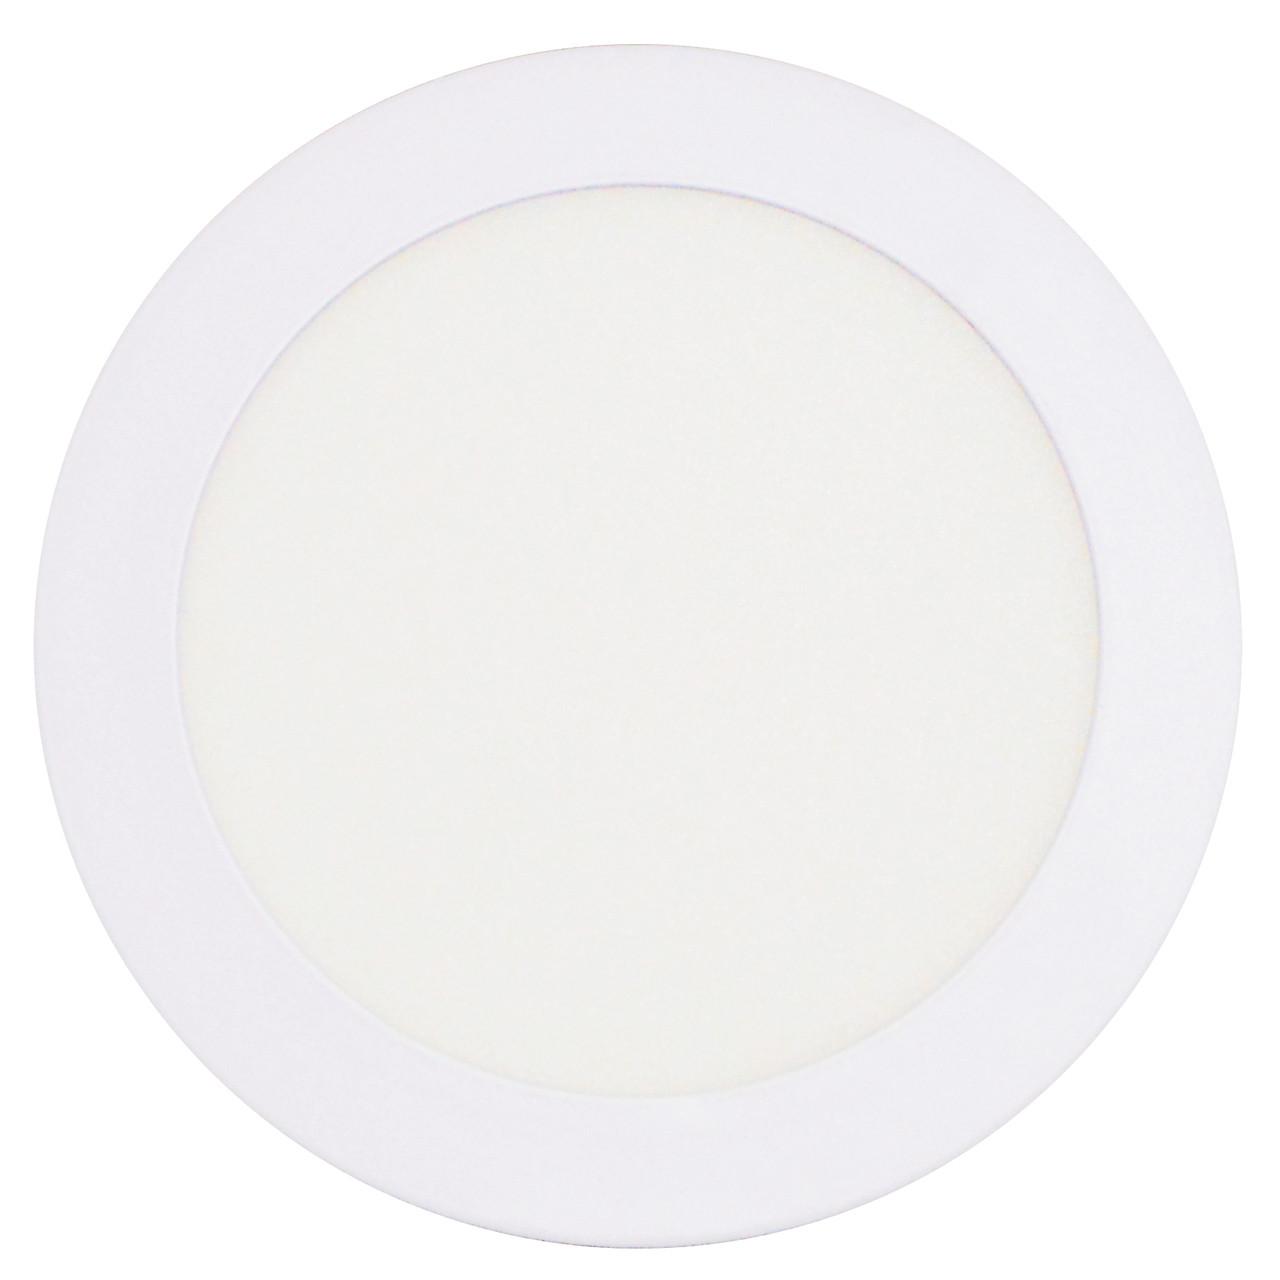 6 led 5cct slim recessed downlight